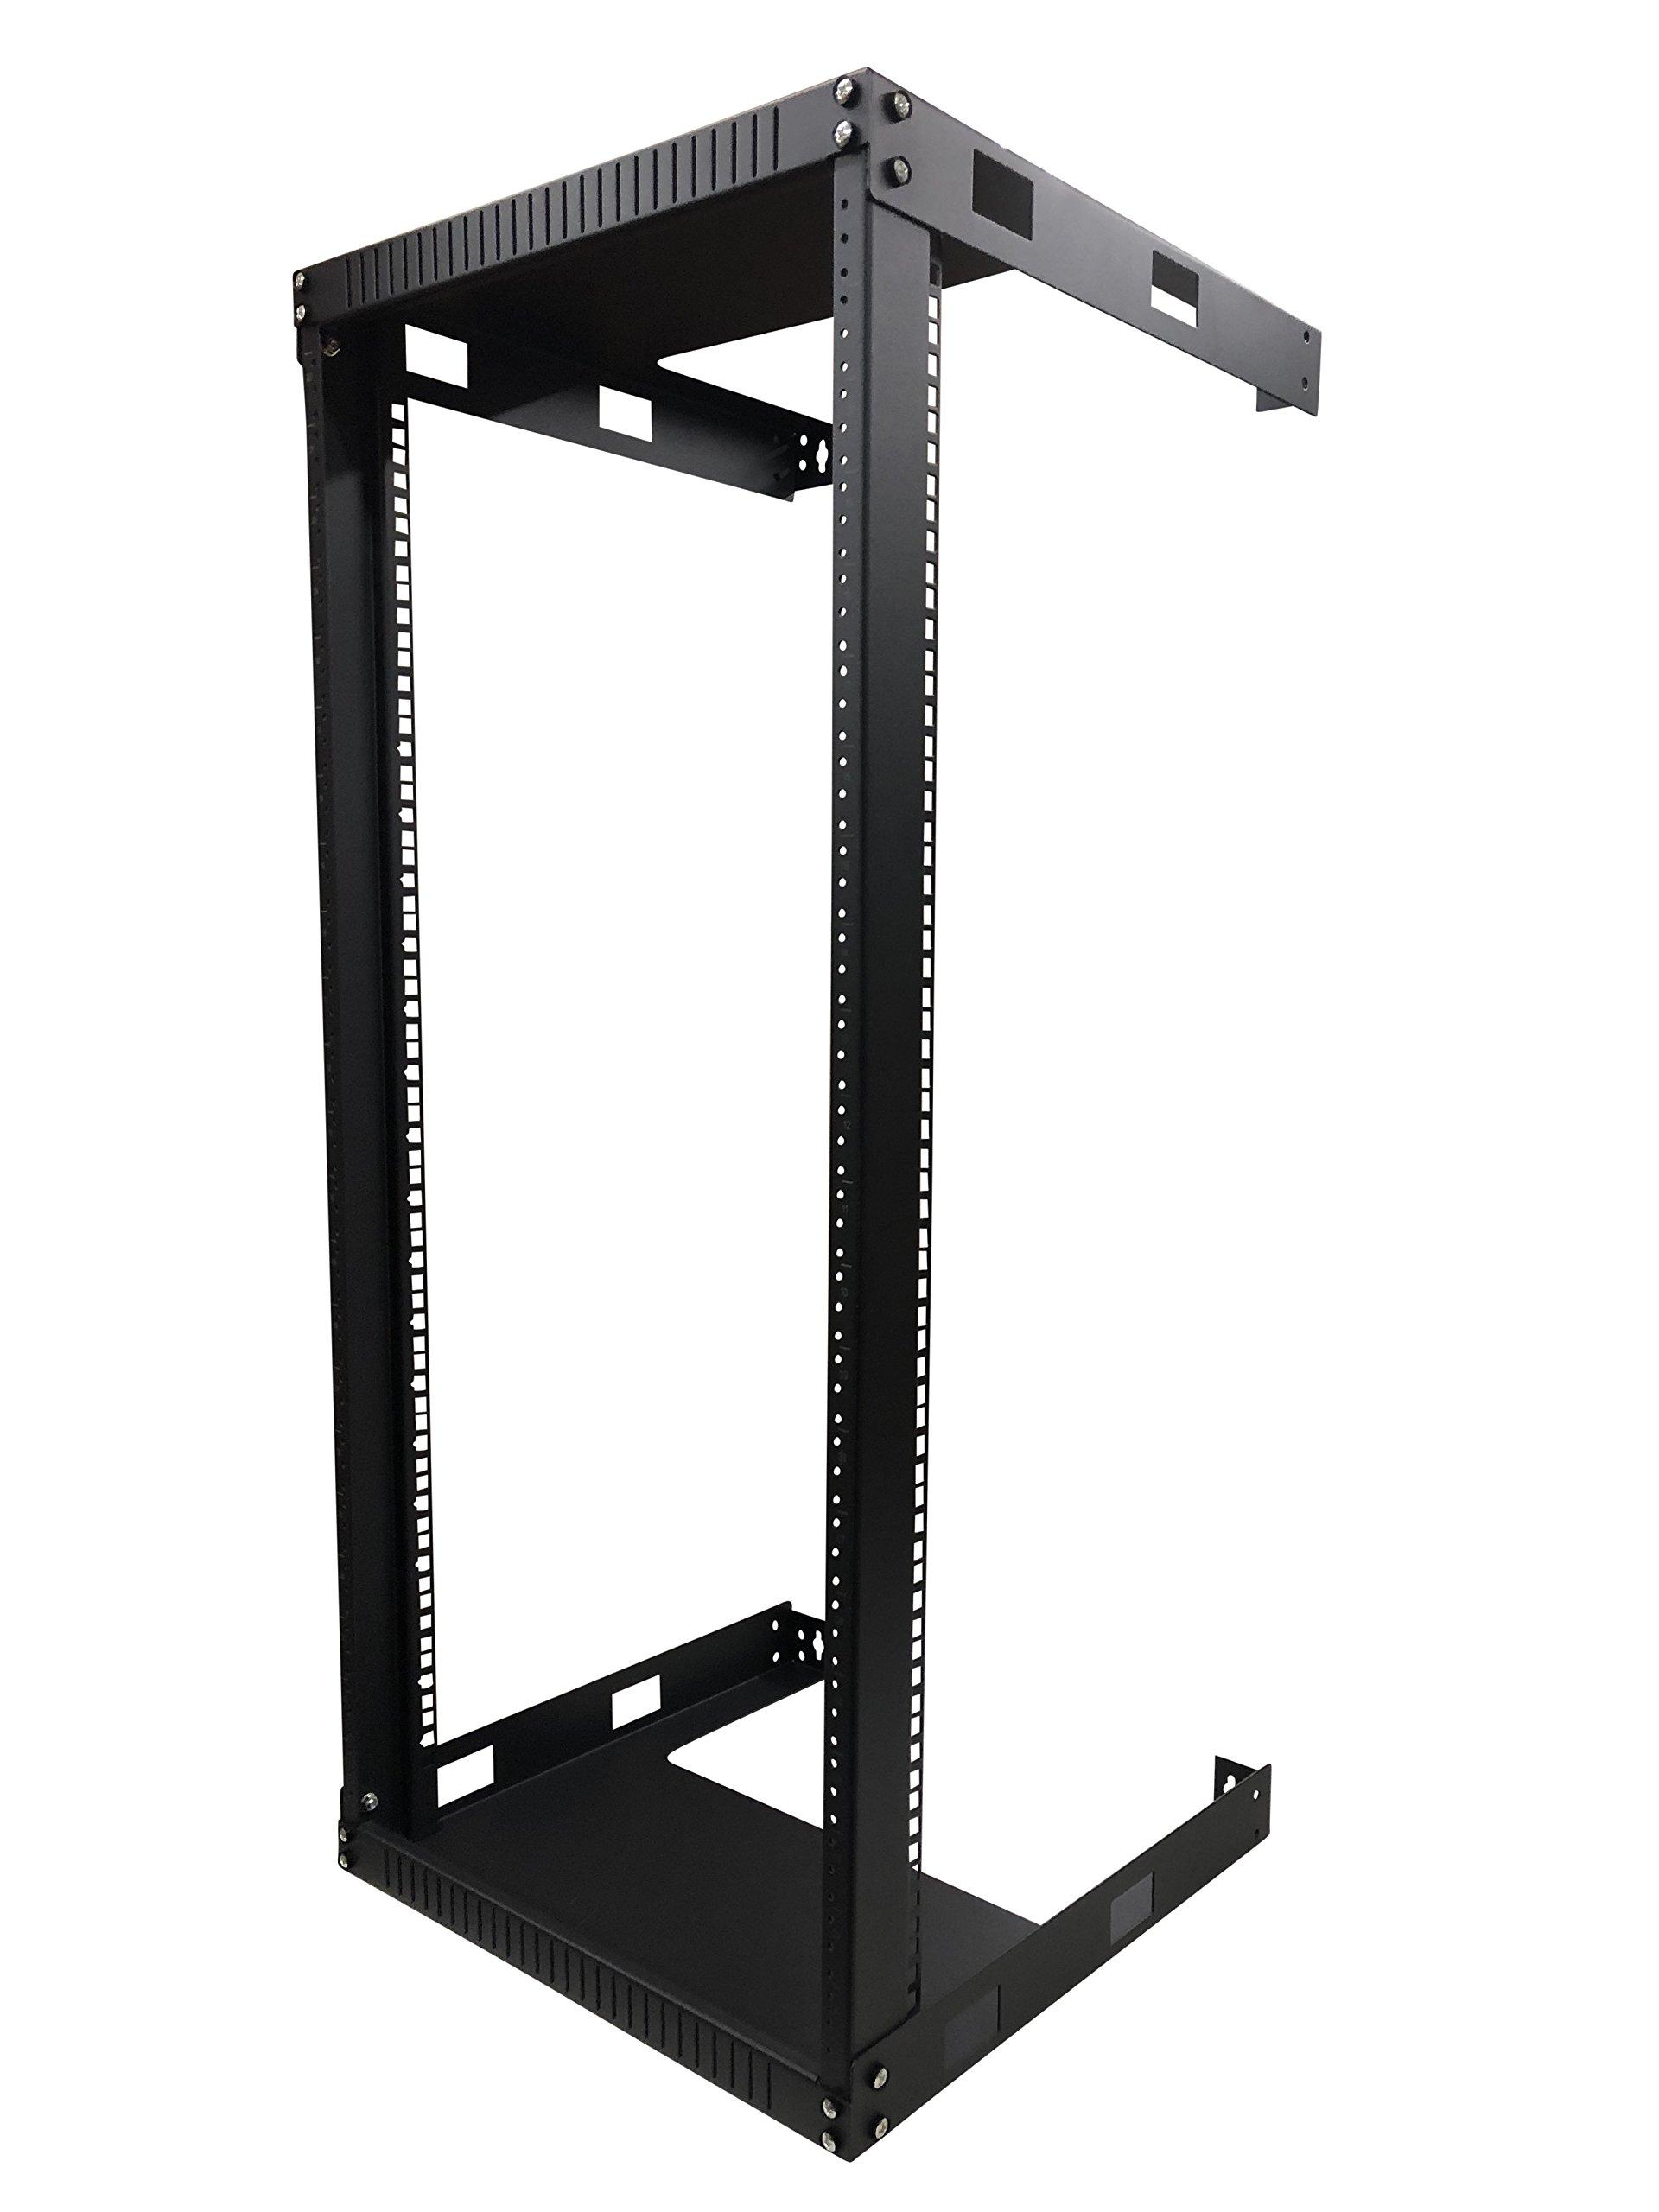 Kenuco 22U Wall Mount Open Frame Steel Network Equipment Rack 17.75 inch Deep